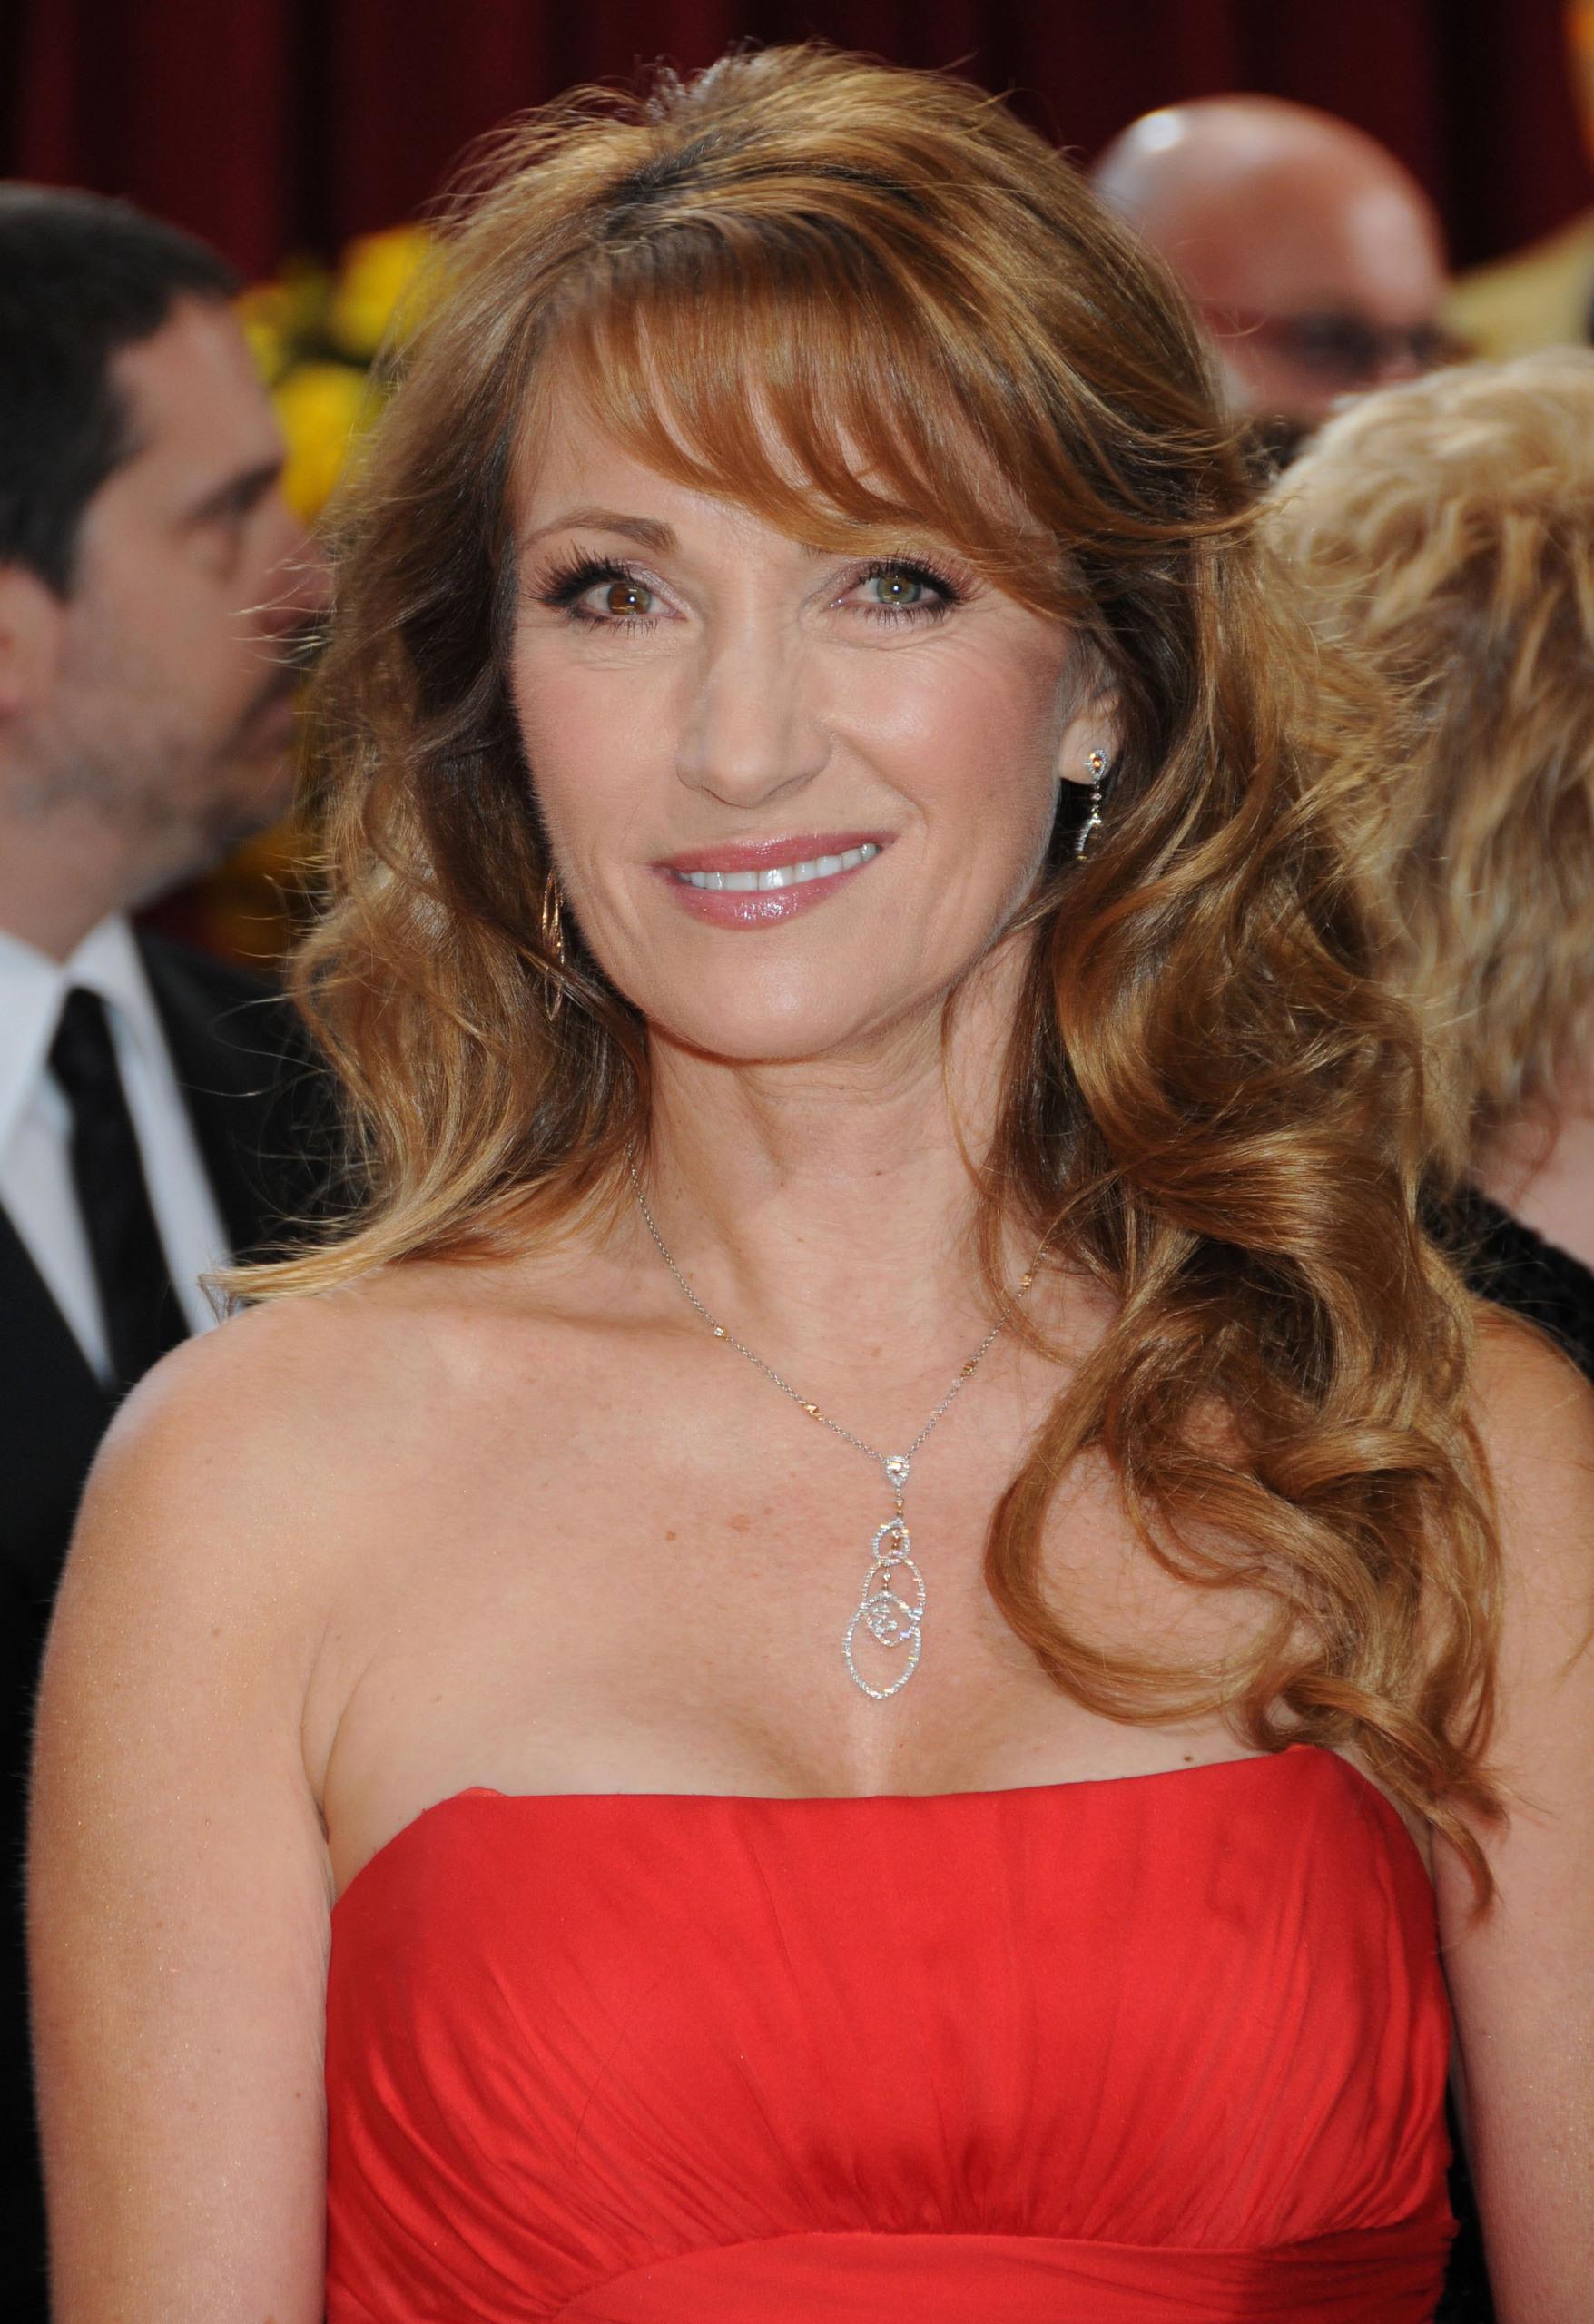 82nd Annual Academy Awards Jane Seymour Photo 31965054